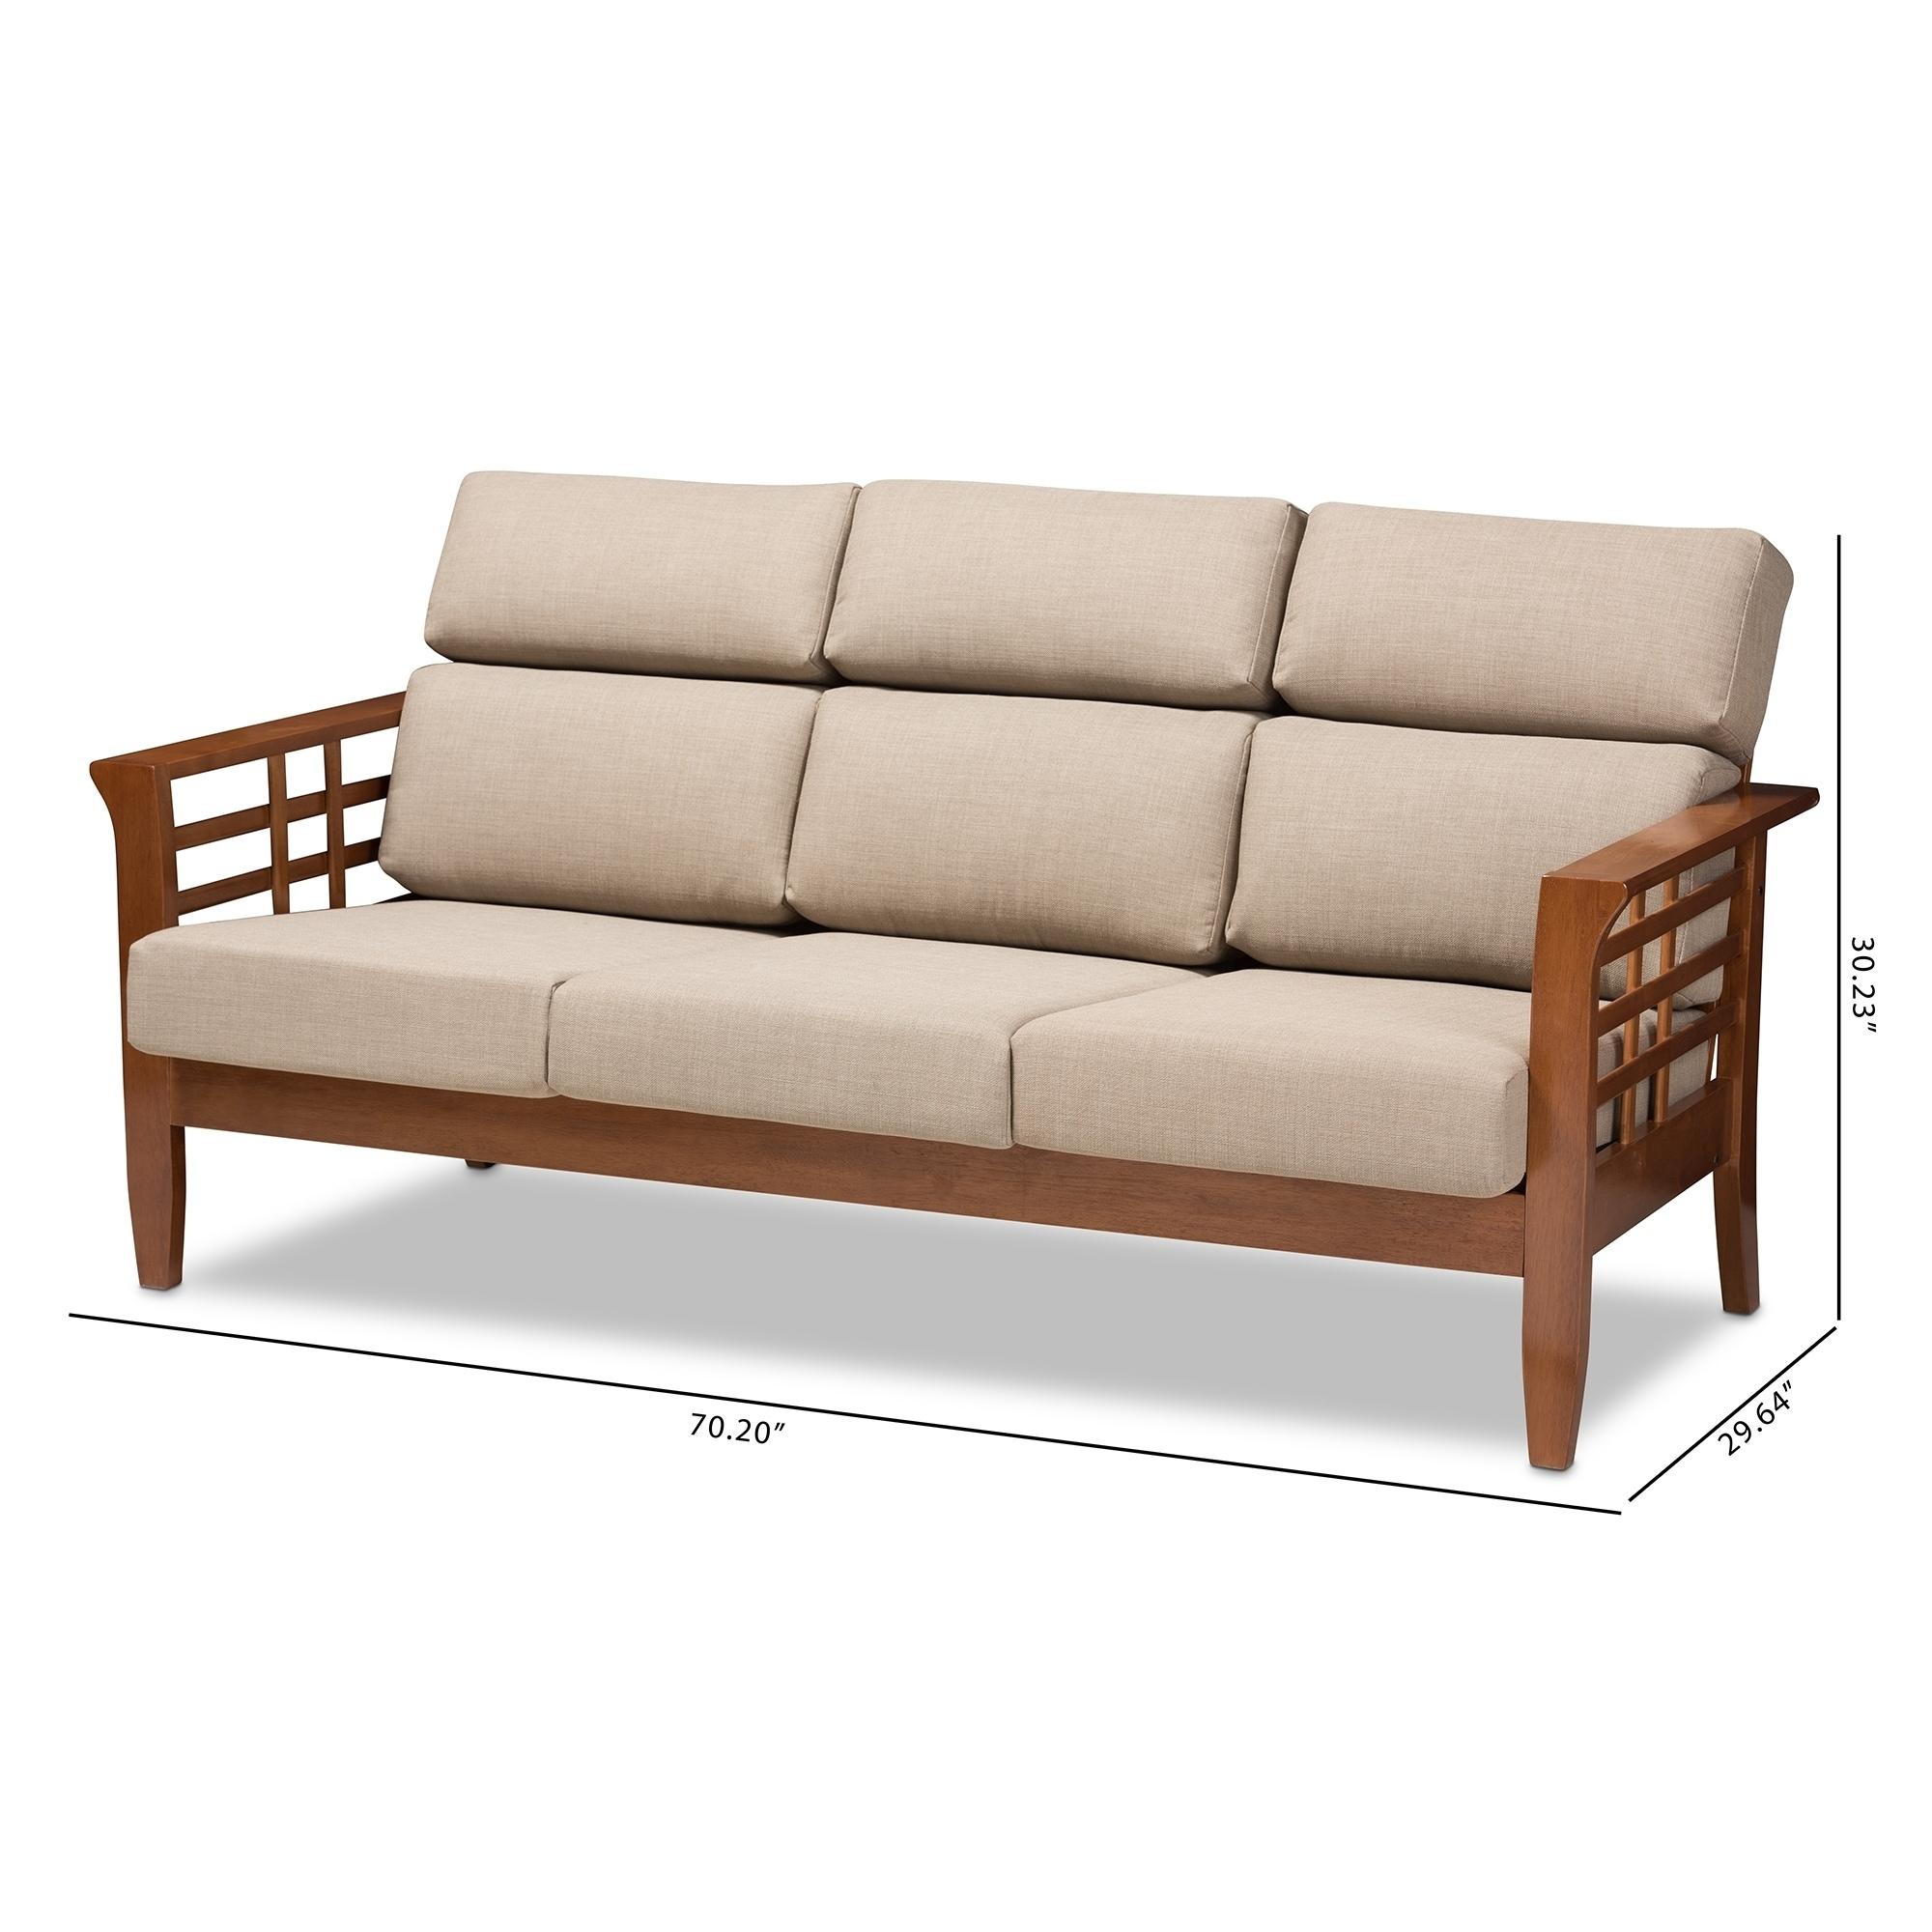 Shop Mission Dark Beige Fabric 3-Seater Sofa by Baxton Studio - On ...